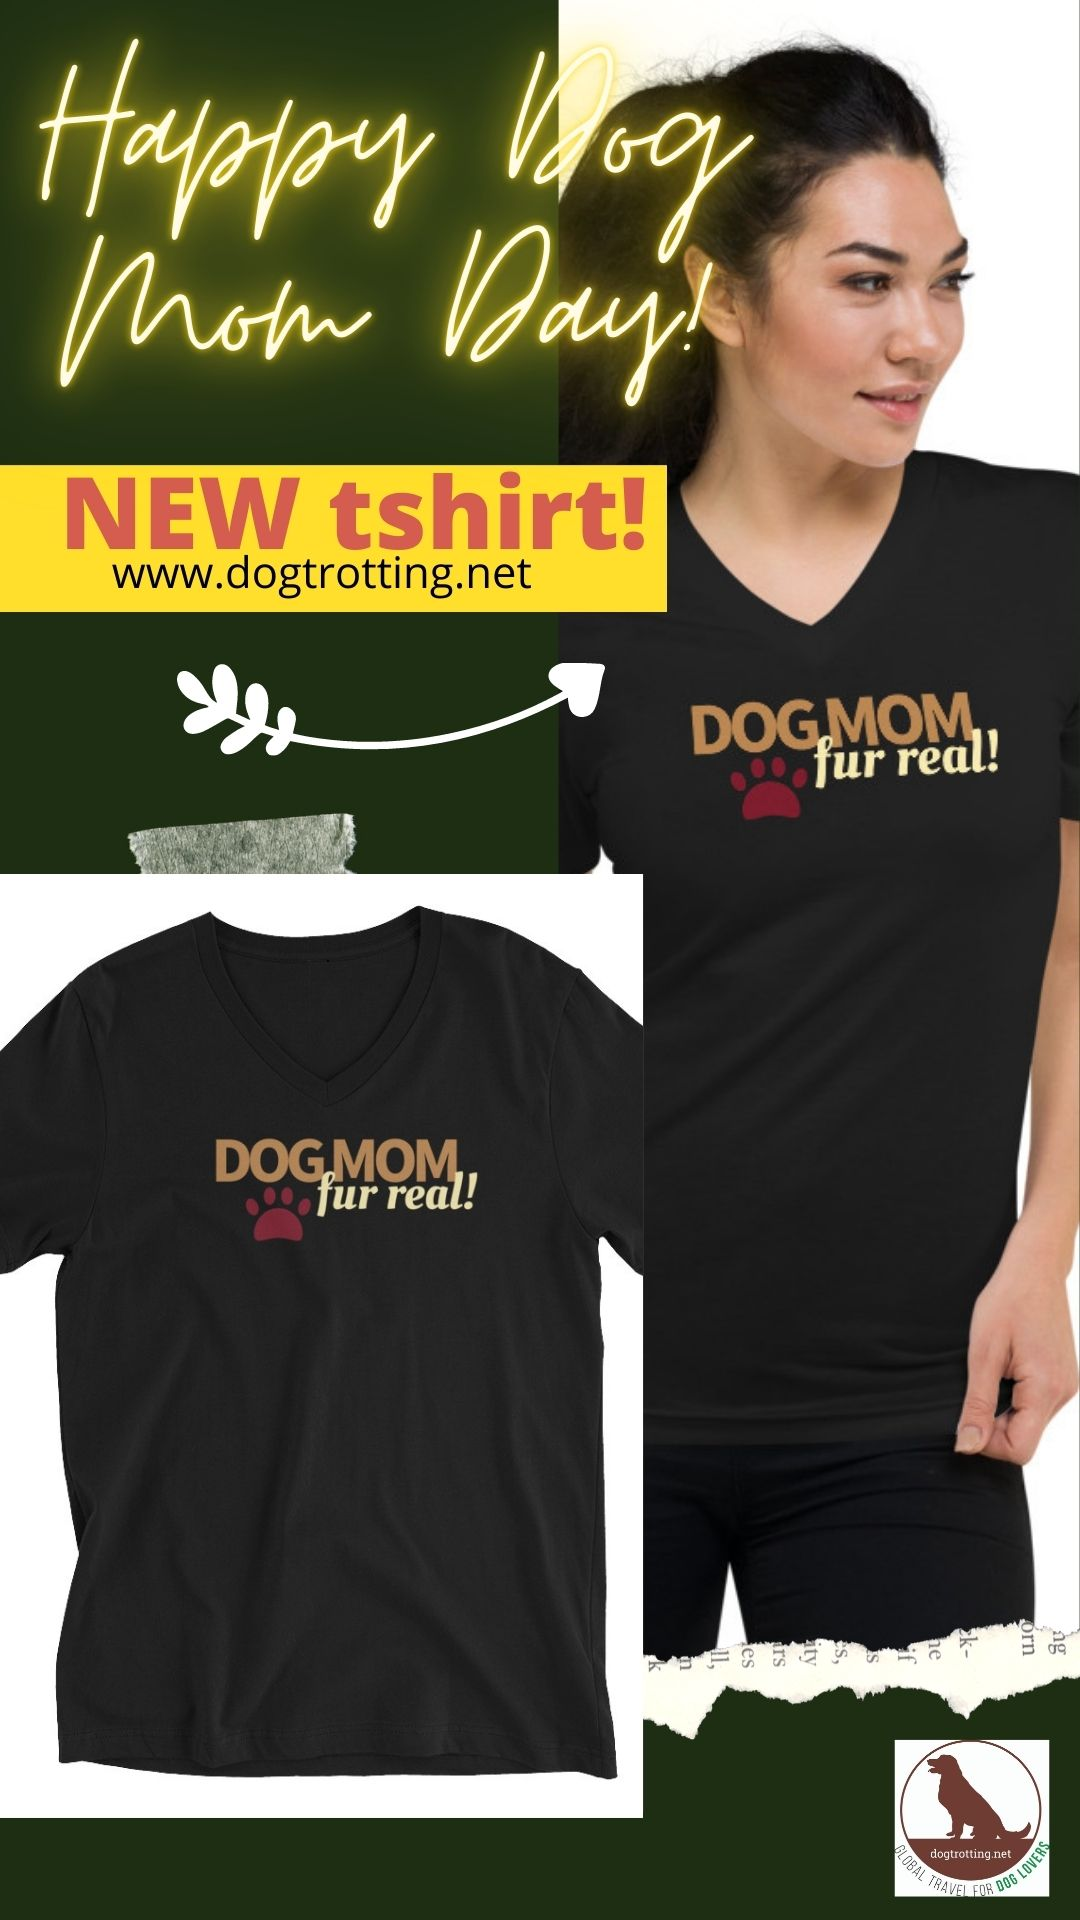 image promoting 'dog mom' tshirt